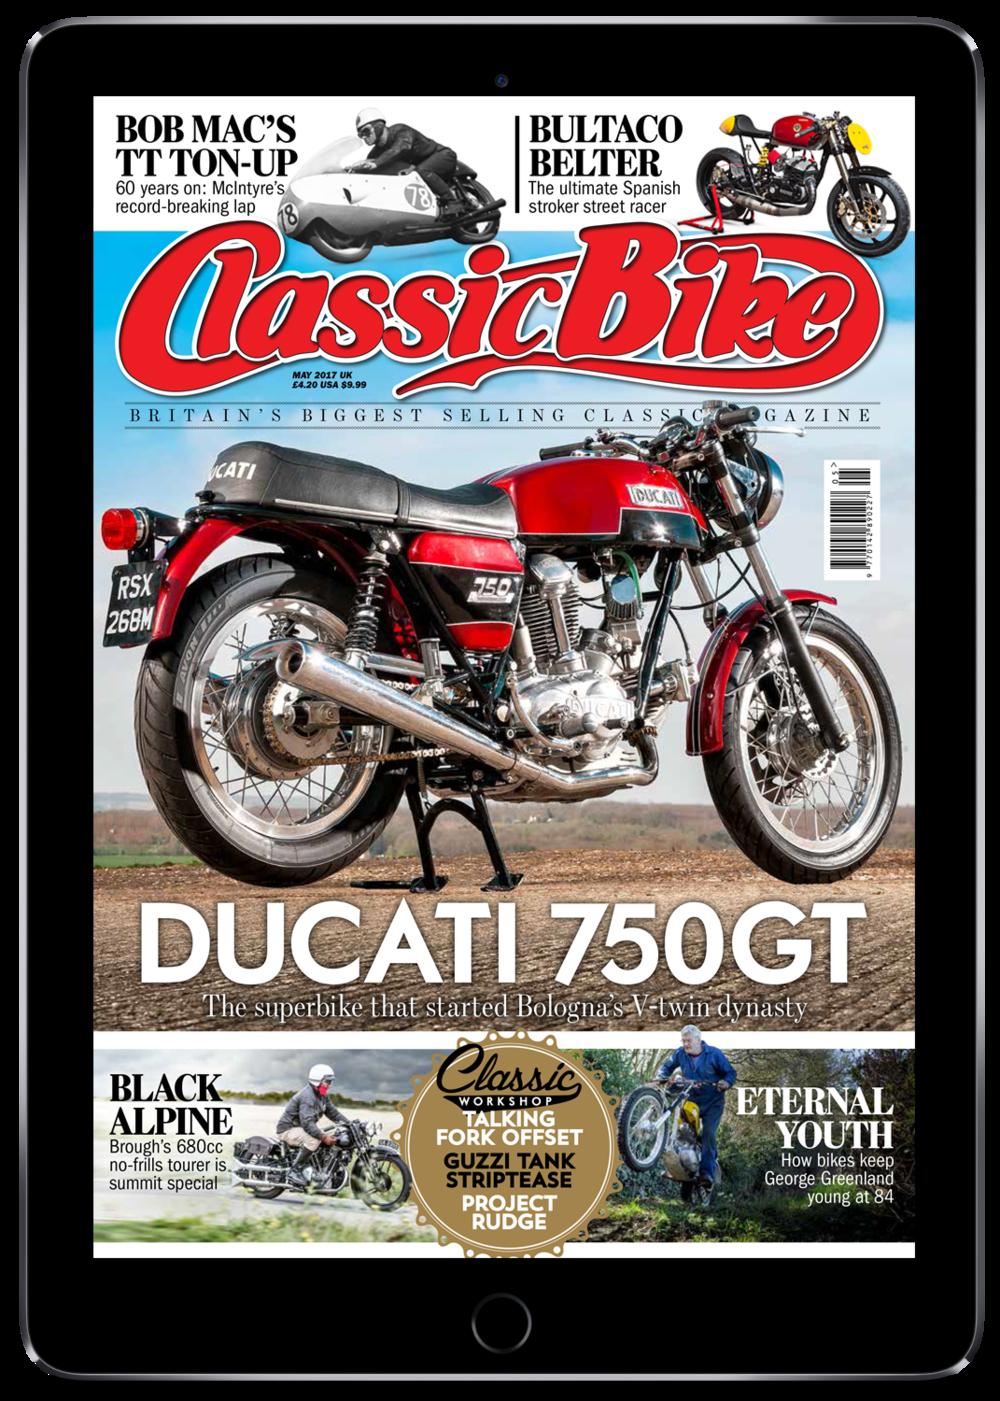 Classic Bike digital edition